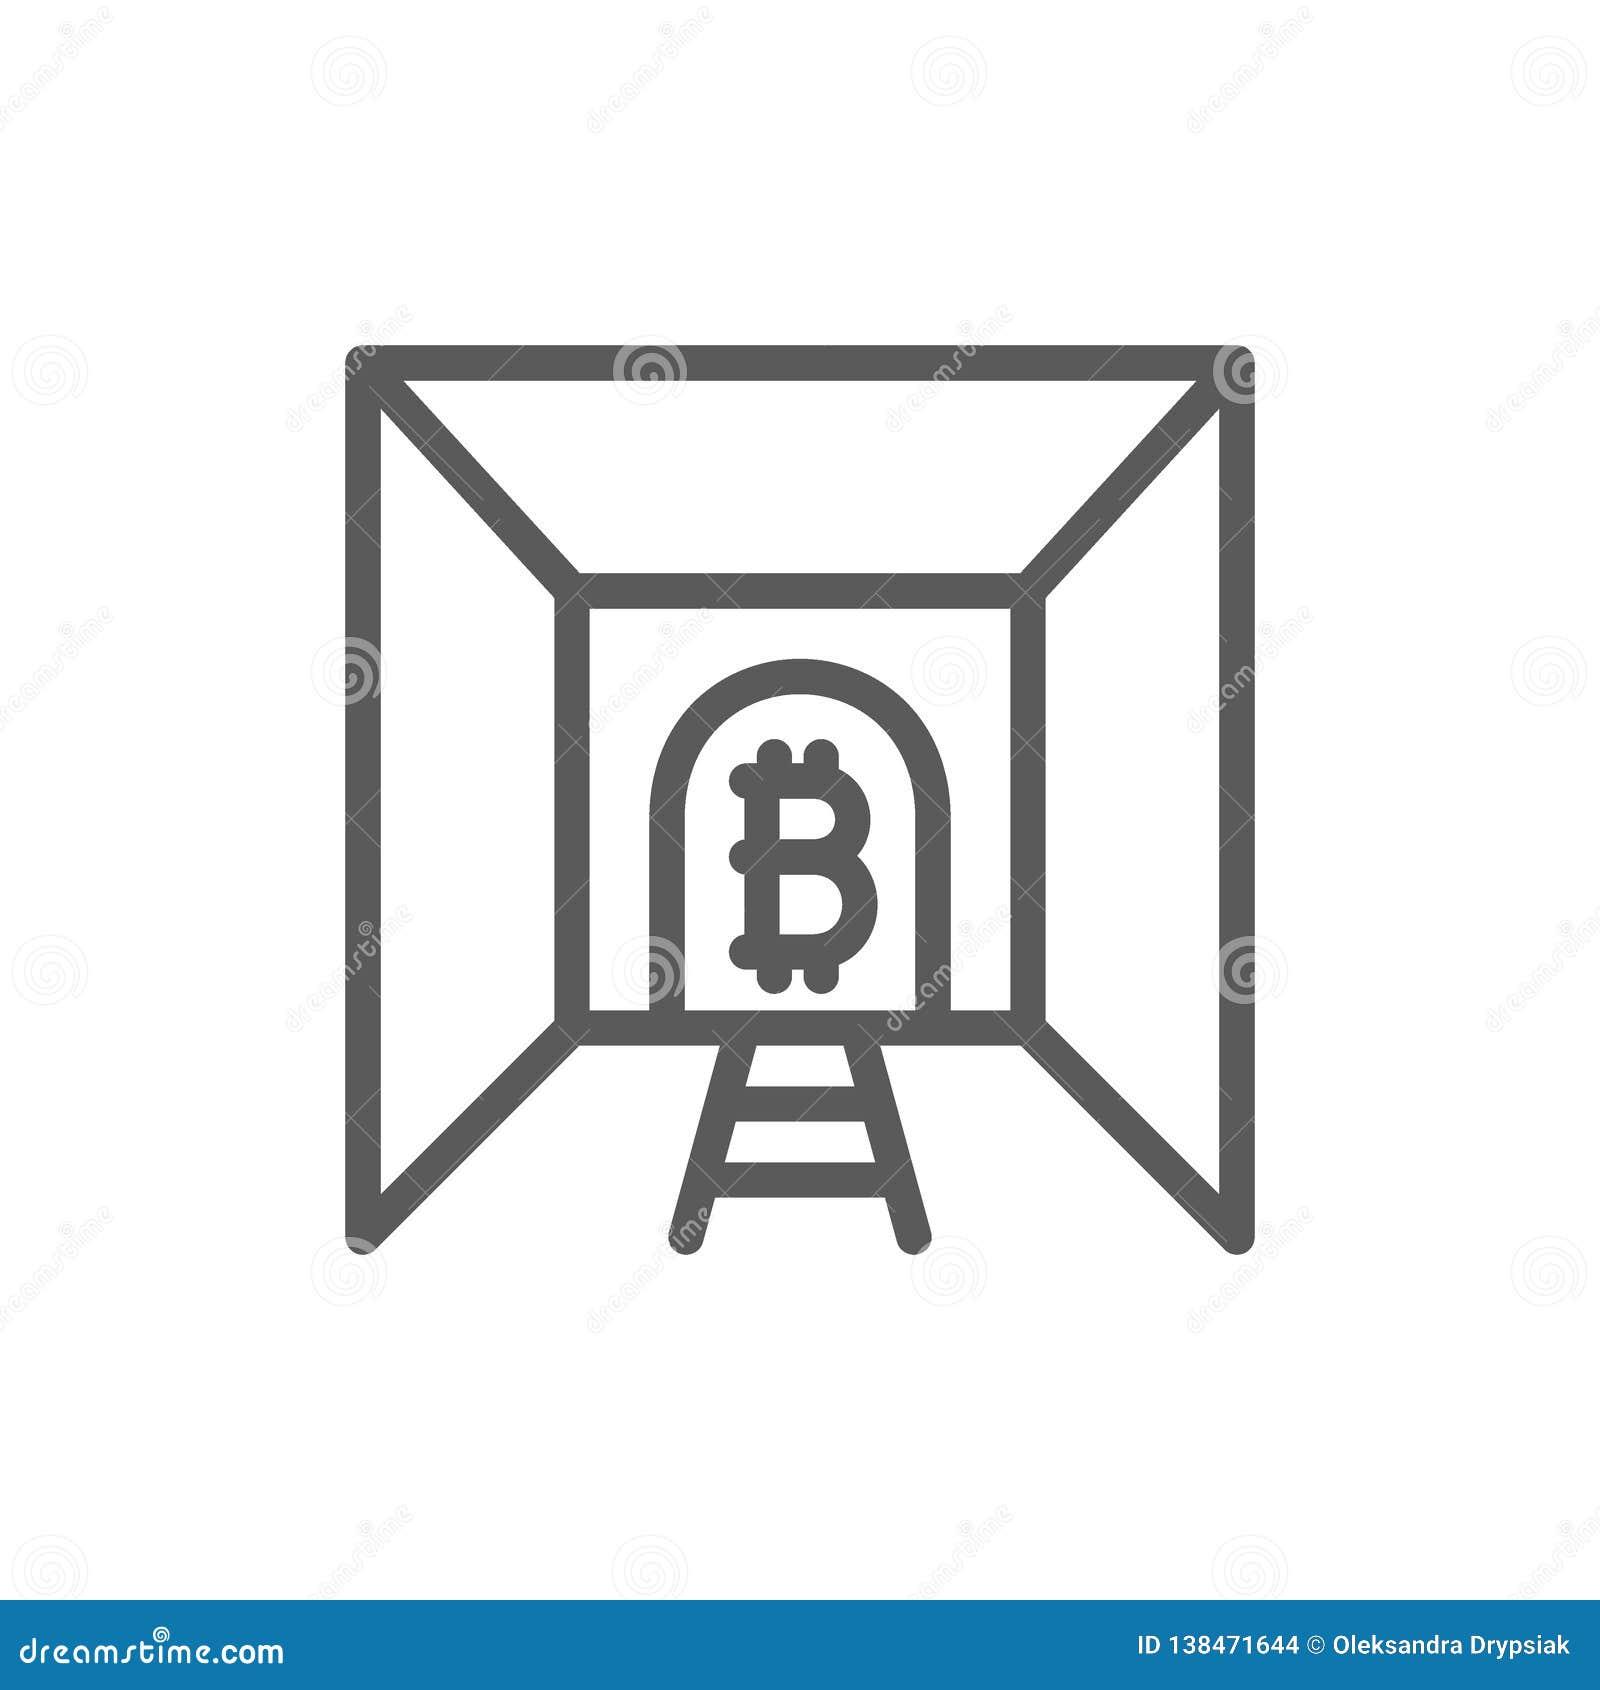 Cumpără Bitcoin Tycoon - Mining Simulation Game